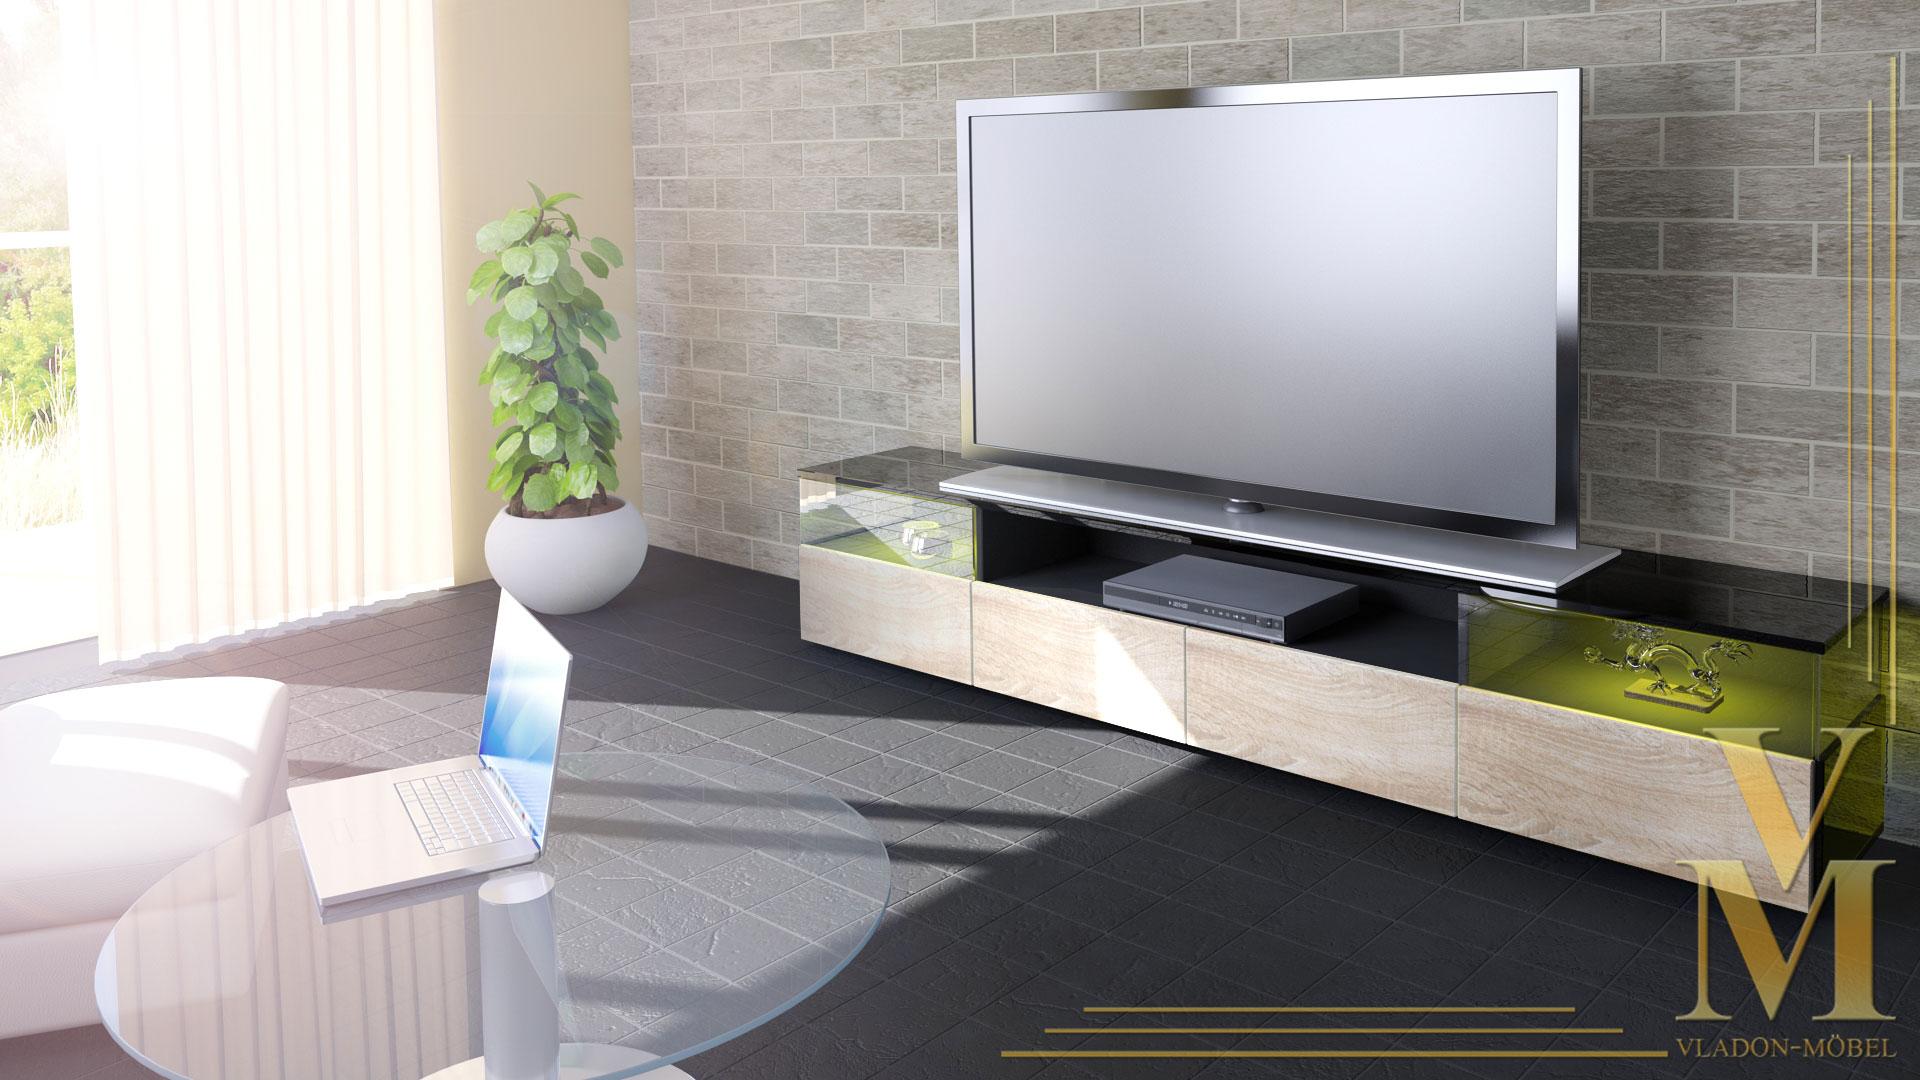 lowboard kommode tv board unterschrank almeria v2 schwarz hochglanz. Black Bedroom Furniture Sets. Home Design Ideas